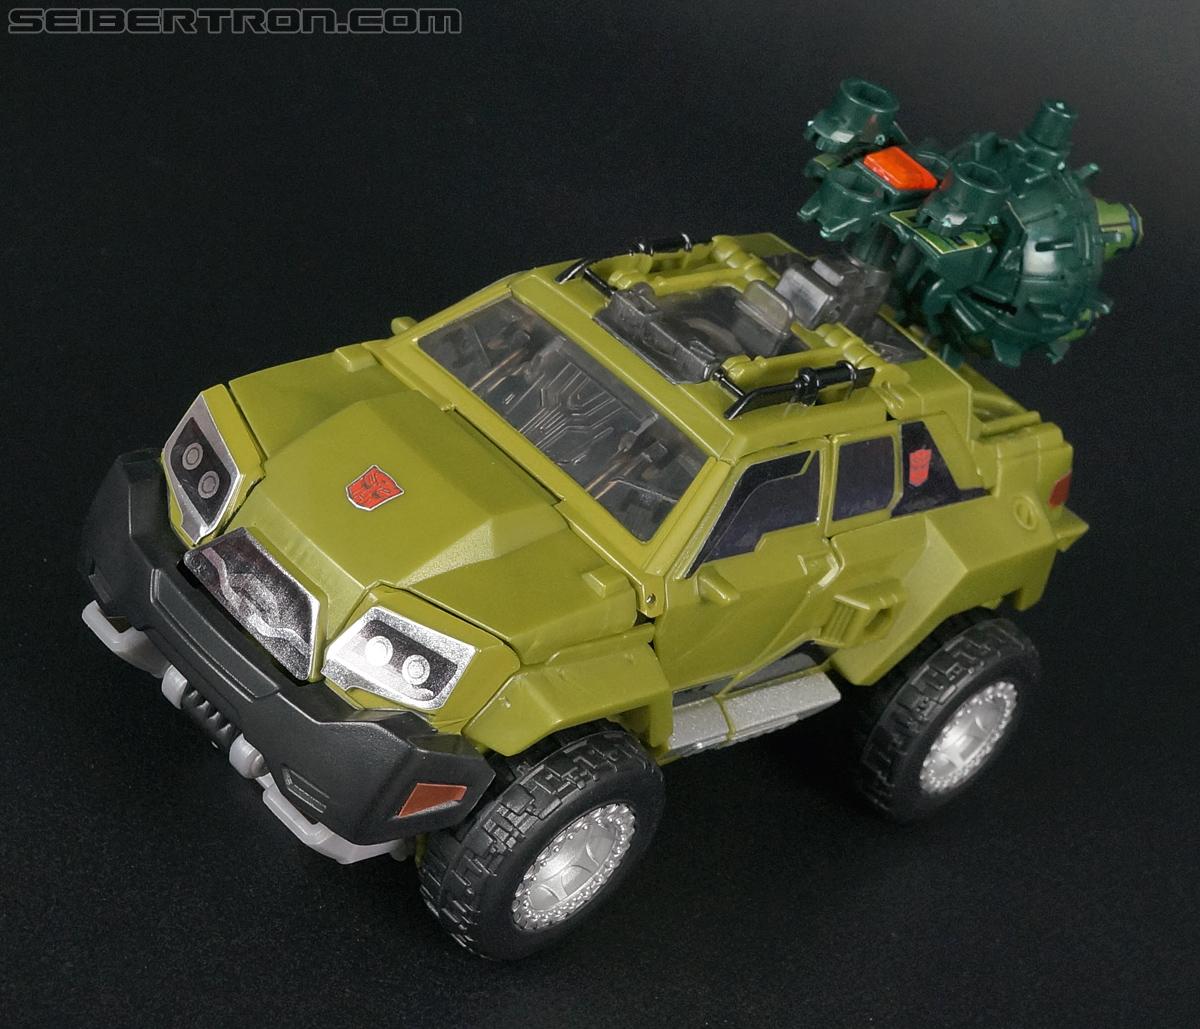 Transformers Arms Micron Bulkhead (Image #39 of 185)